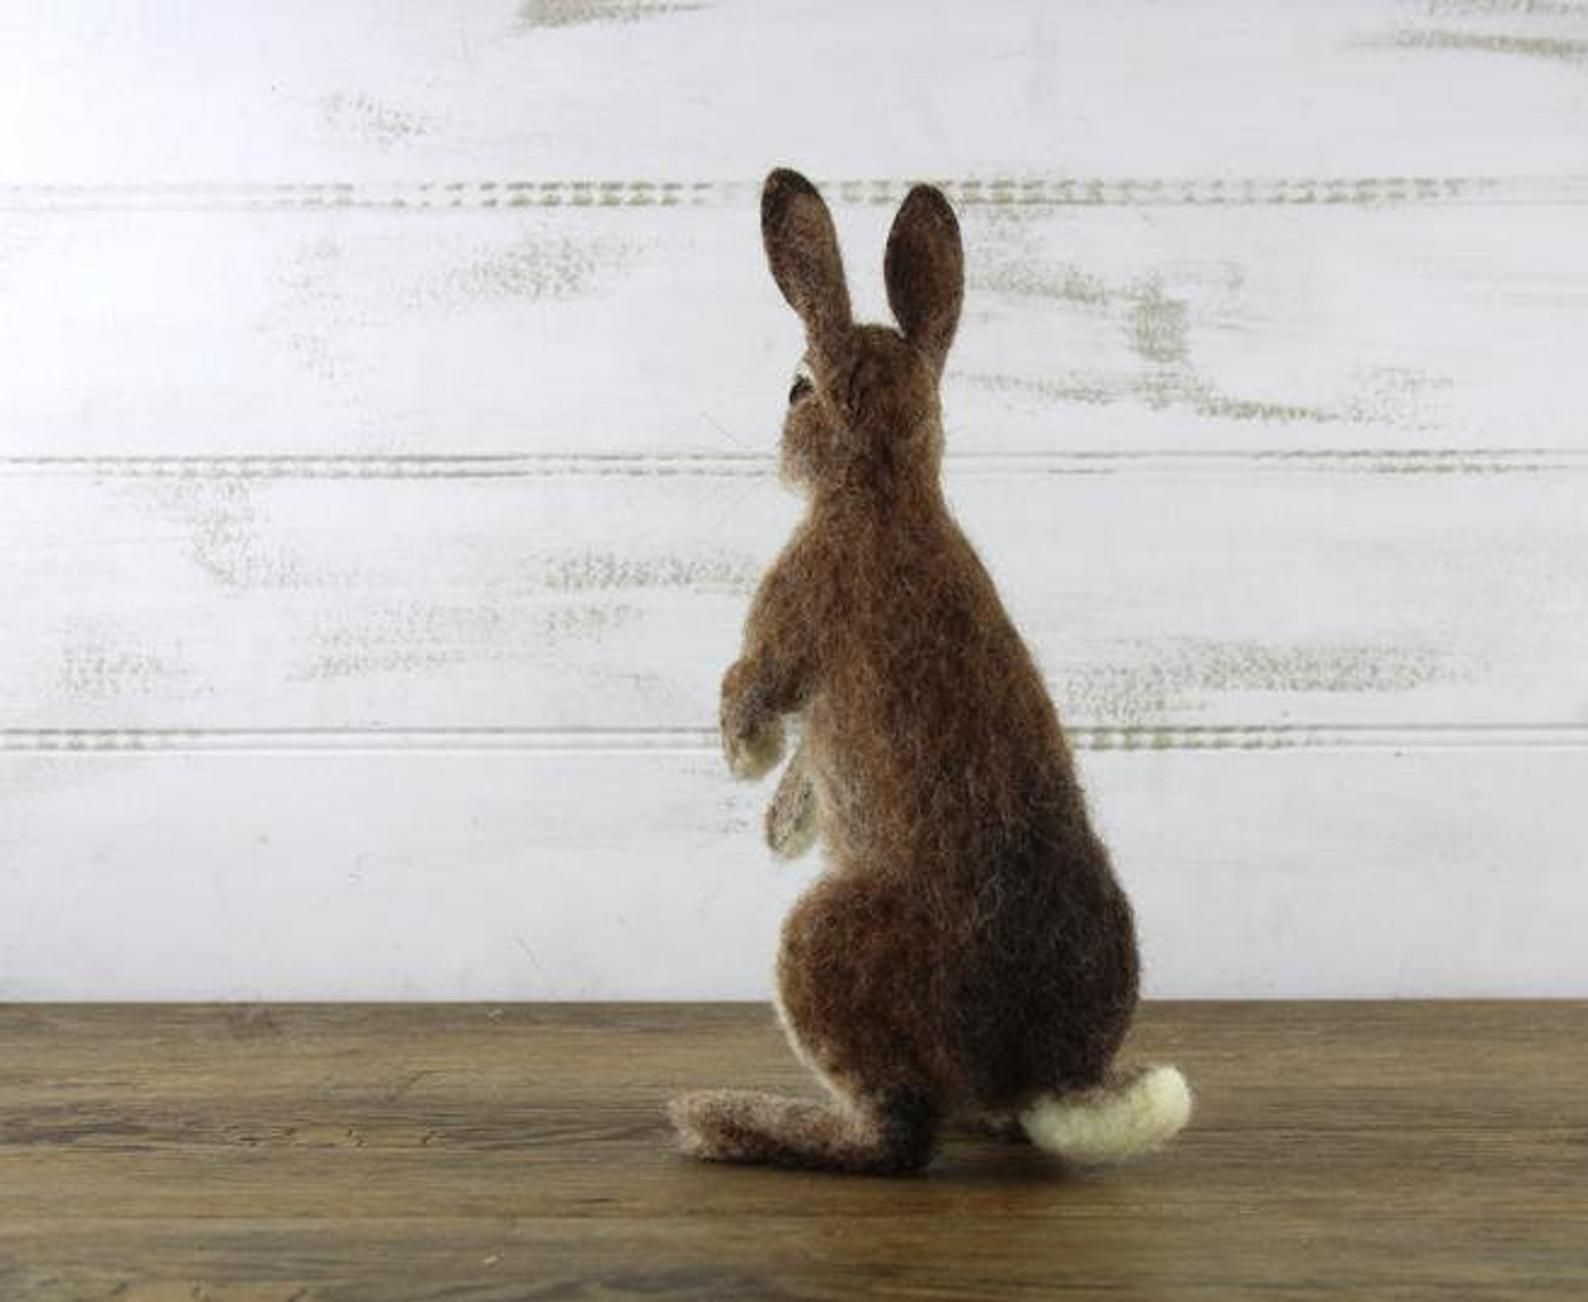 Romeo the Rabbit complete needle felting kit bunny #needlefeltedbunny Romeo the Rabbit complete needle felting kit bunny | Etsy #needlefeltedbunny Romeo the Rabbit complete needle felting kit bunny #needlefeltedbunny Romeo the Rabbit complete needle felting kit bunny | Etsy #needlefeltedbunny Romeo the Rabbit complete needle felting kit bunny #needlefeltedbunny Romeo the Rabbit complete needle felting kit bunny | Etsy #needlefeltedbunny Romeo the Rabbit complete needle felting kit bunny #needlef #needlefeltedbunny